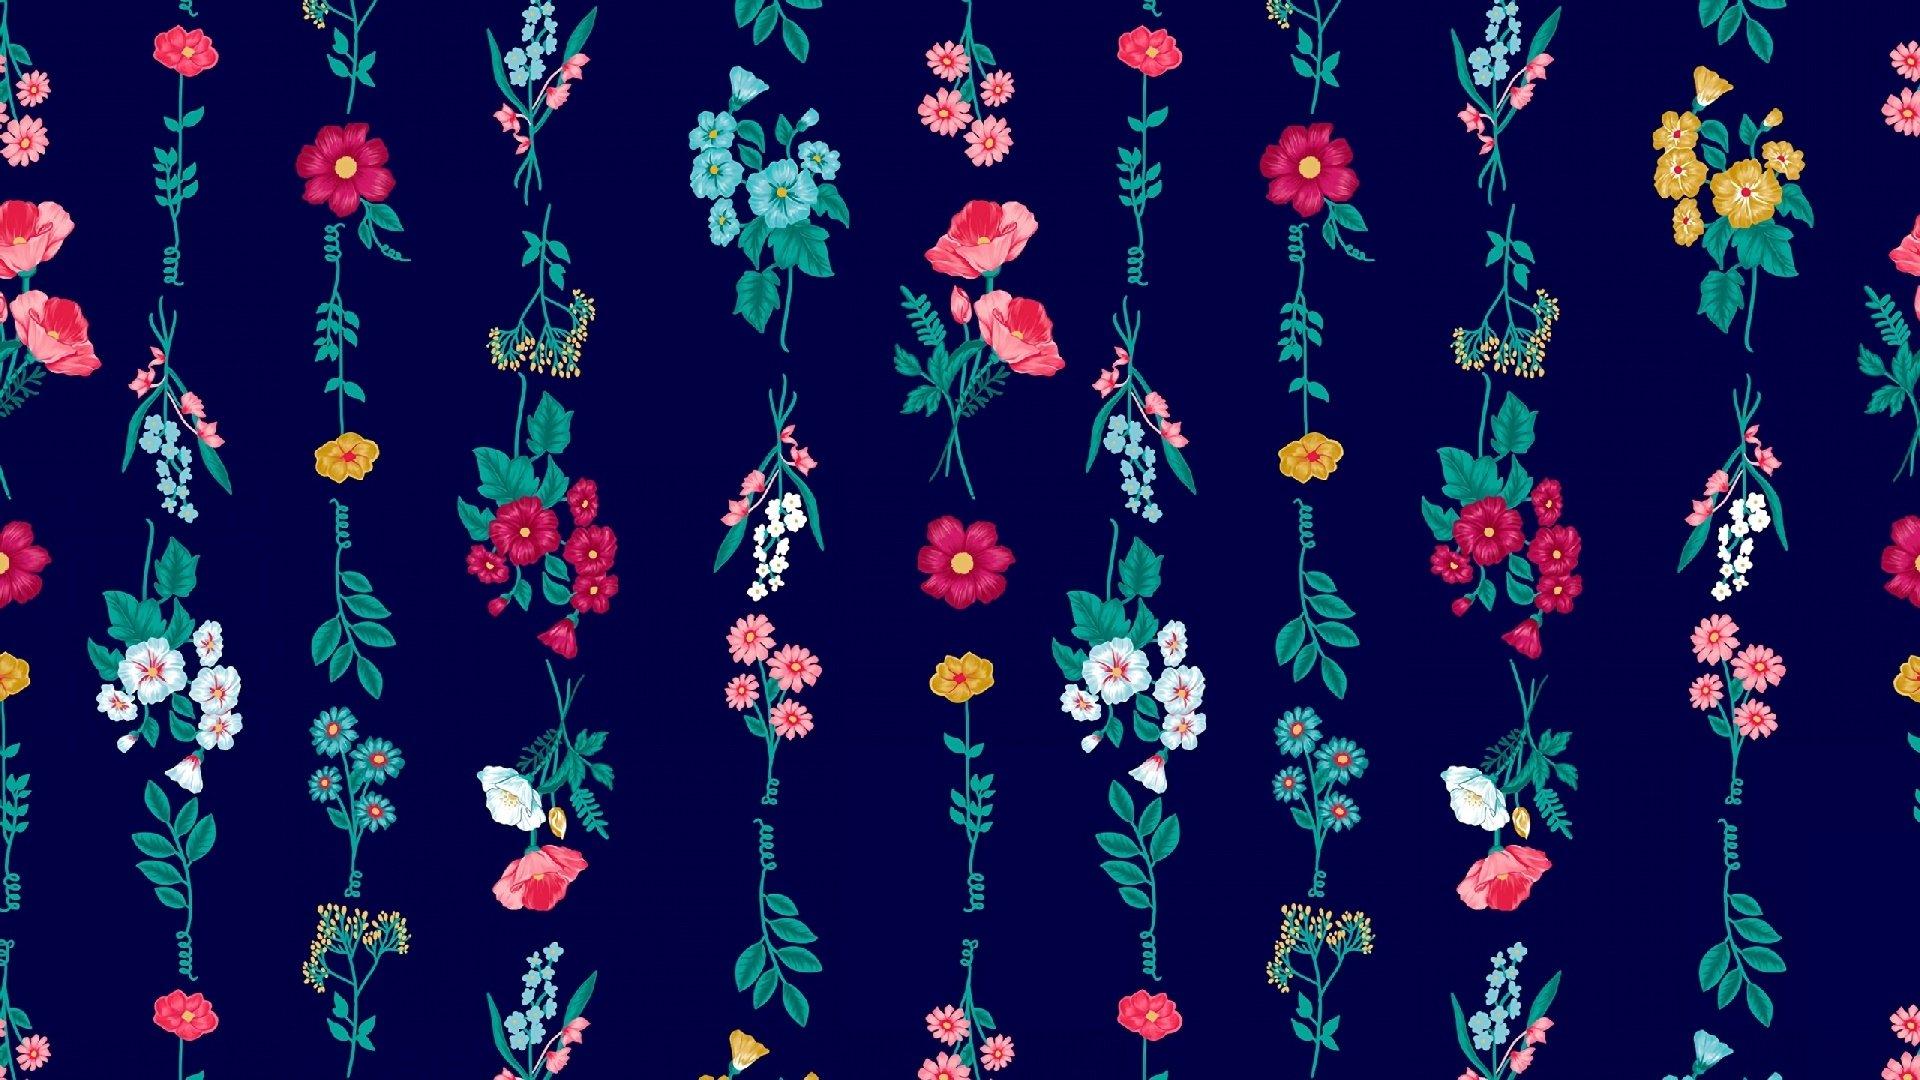 Flower Pattern Hd Wallpaper Background Image 1920x1080 Id 998820 Wallpaper Abyss